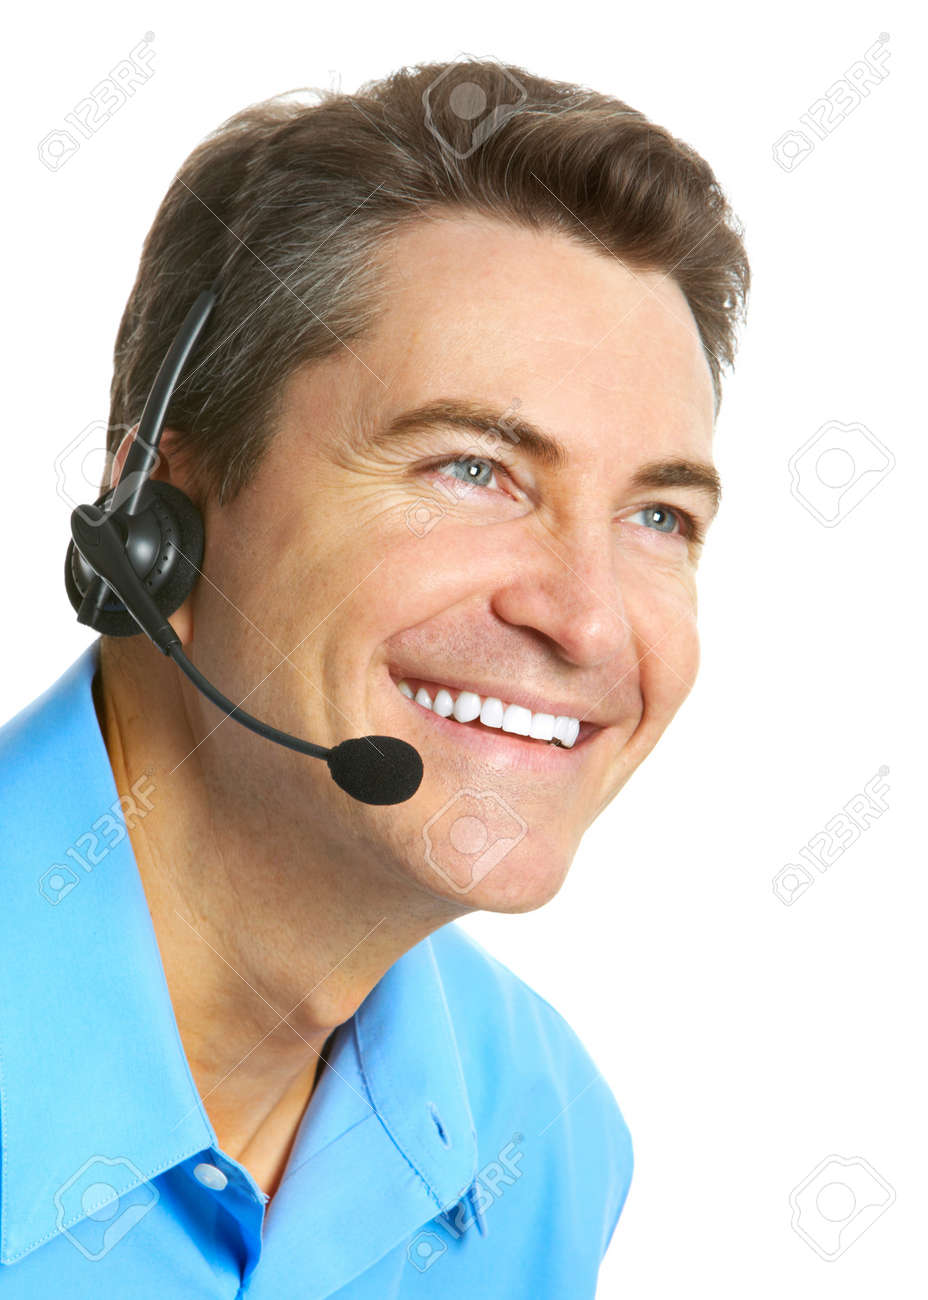 Smiling customer service operator. Over white background Stock Photo - 7251920